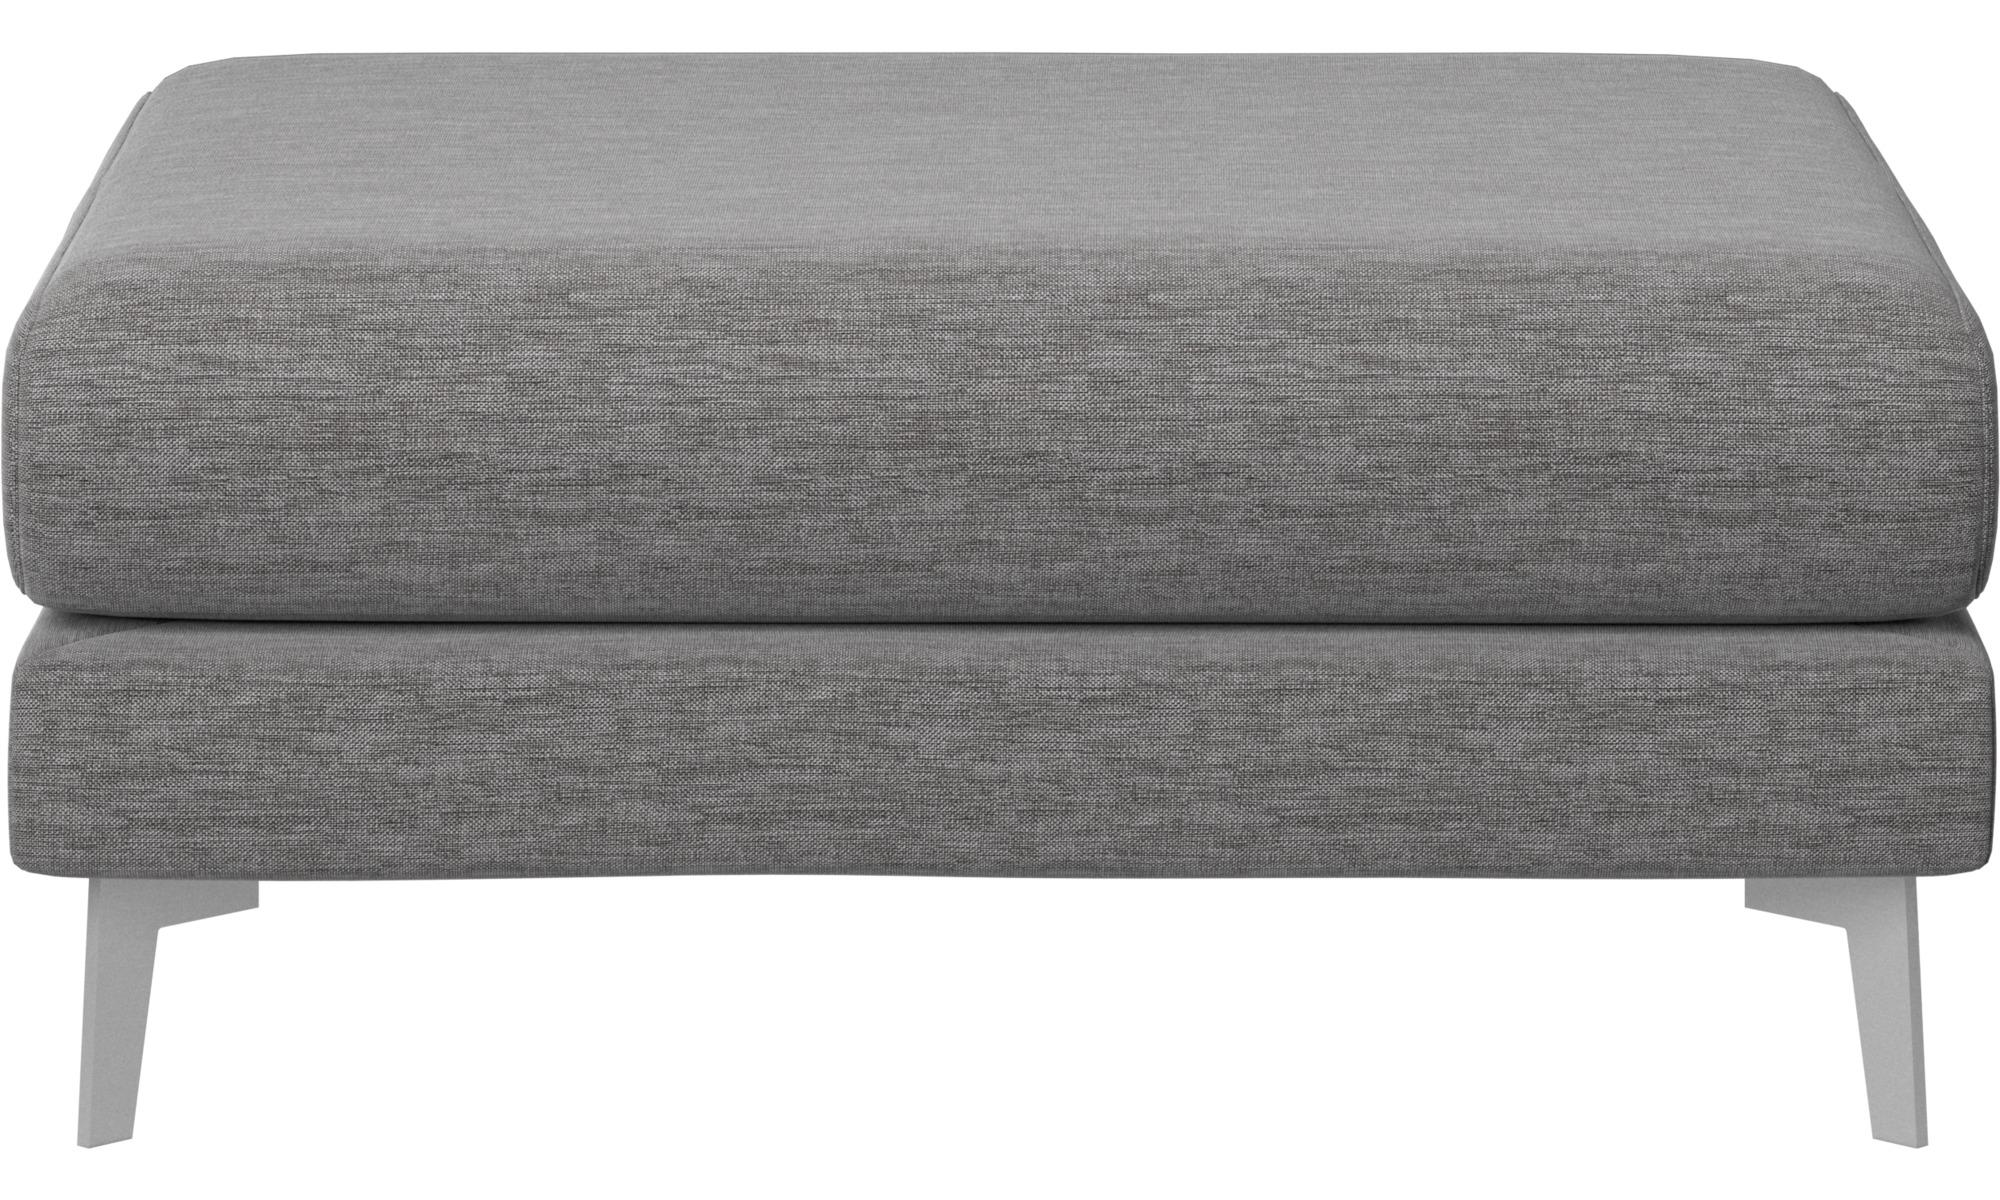 ottomans fargo ottoman boconcept. Black Bedroom Furniture Sets. Home Design Ideas